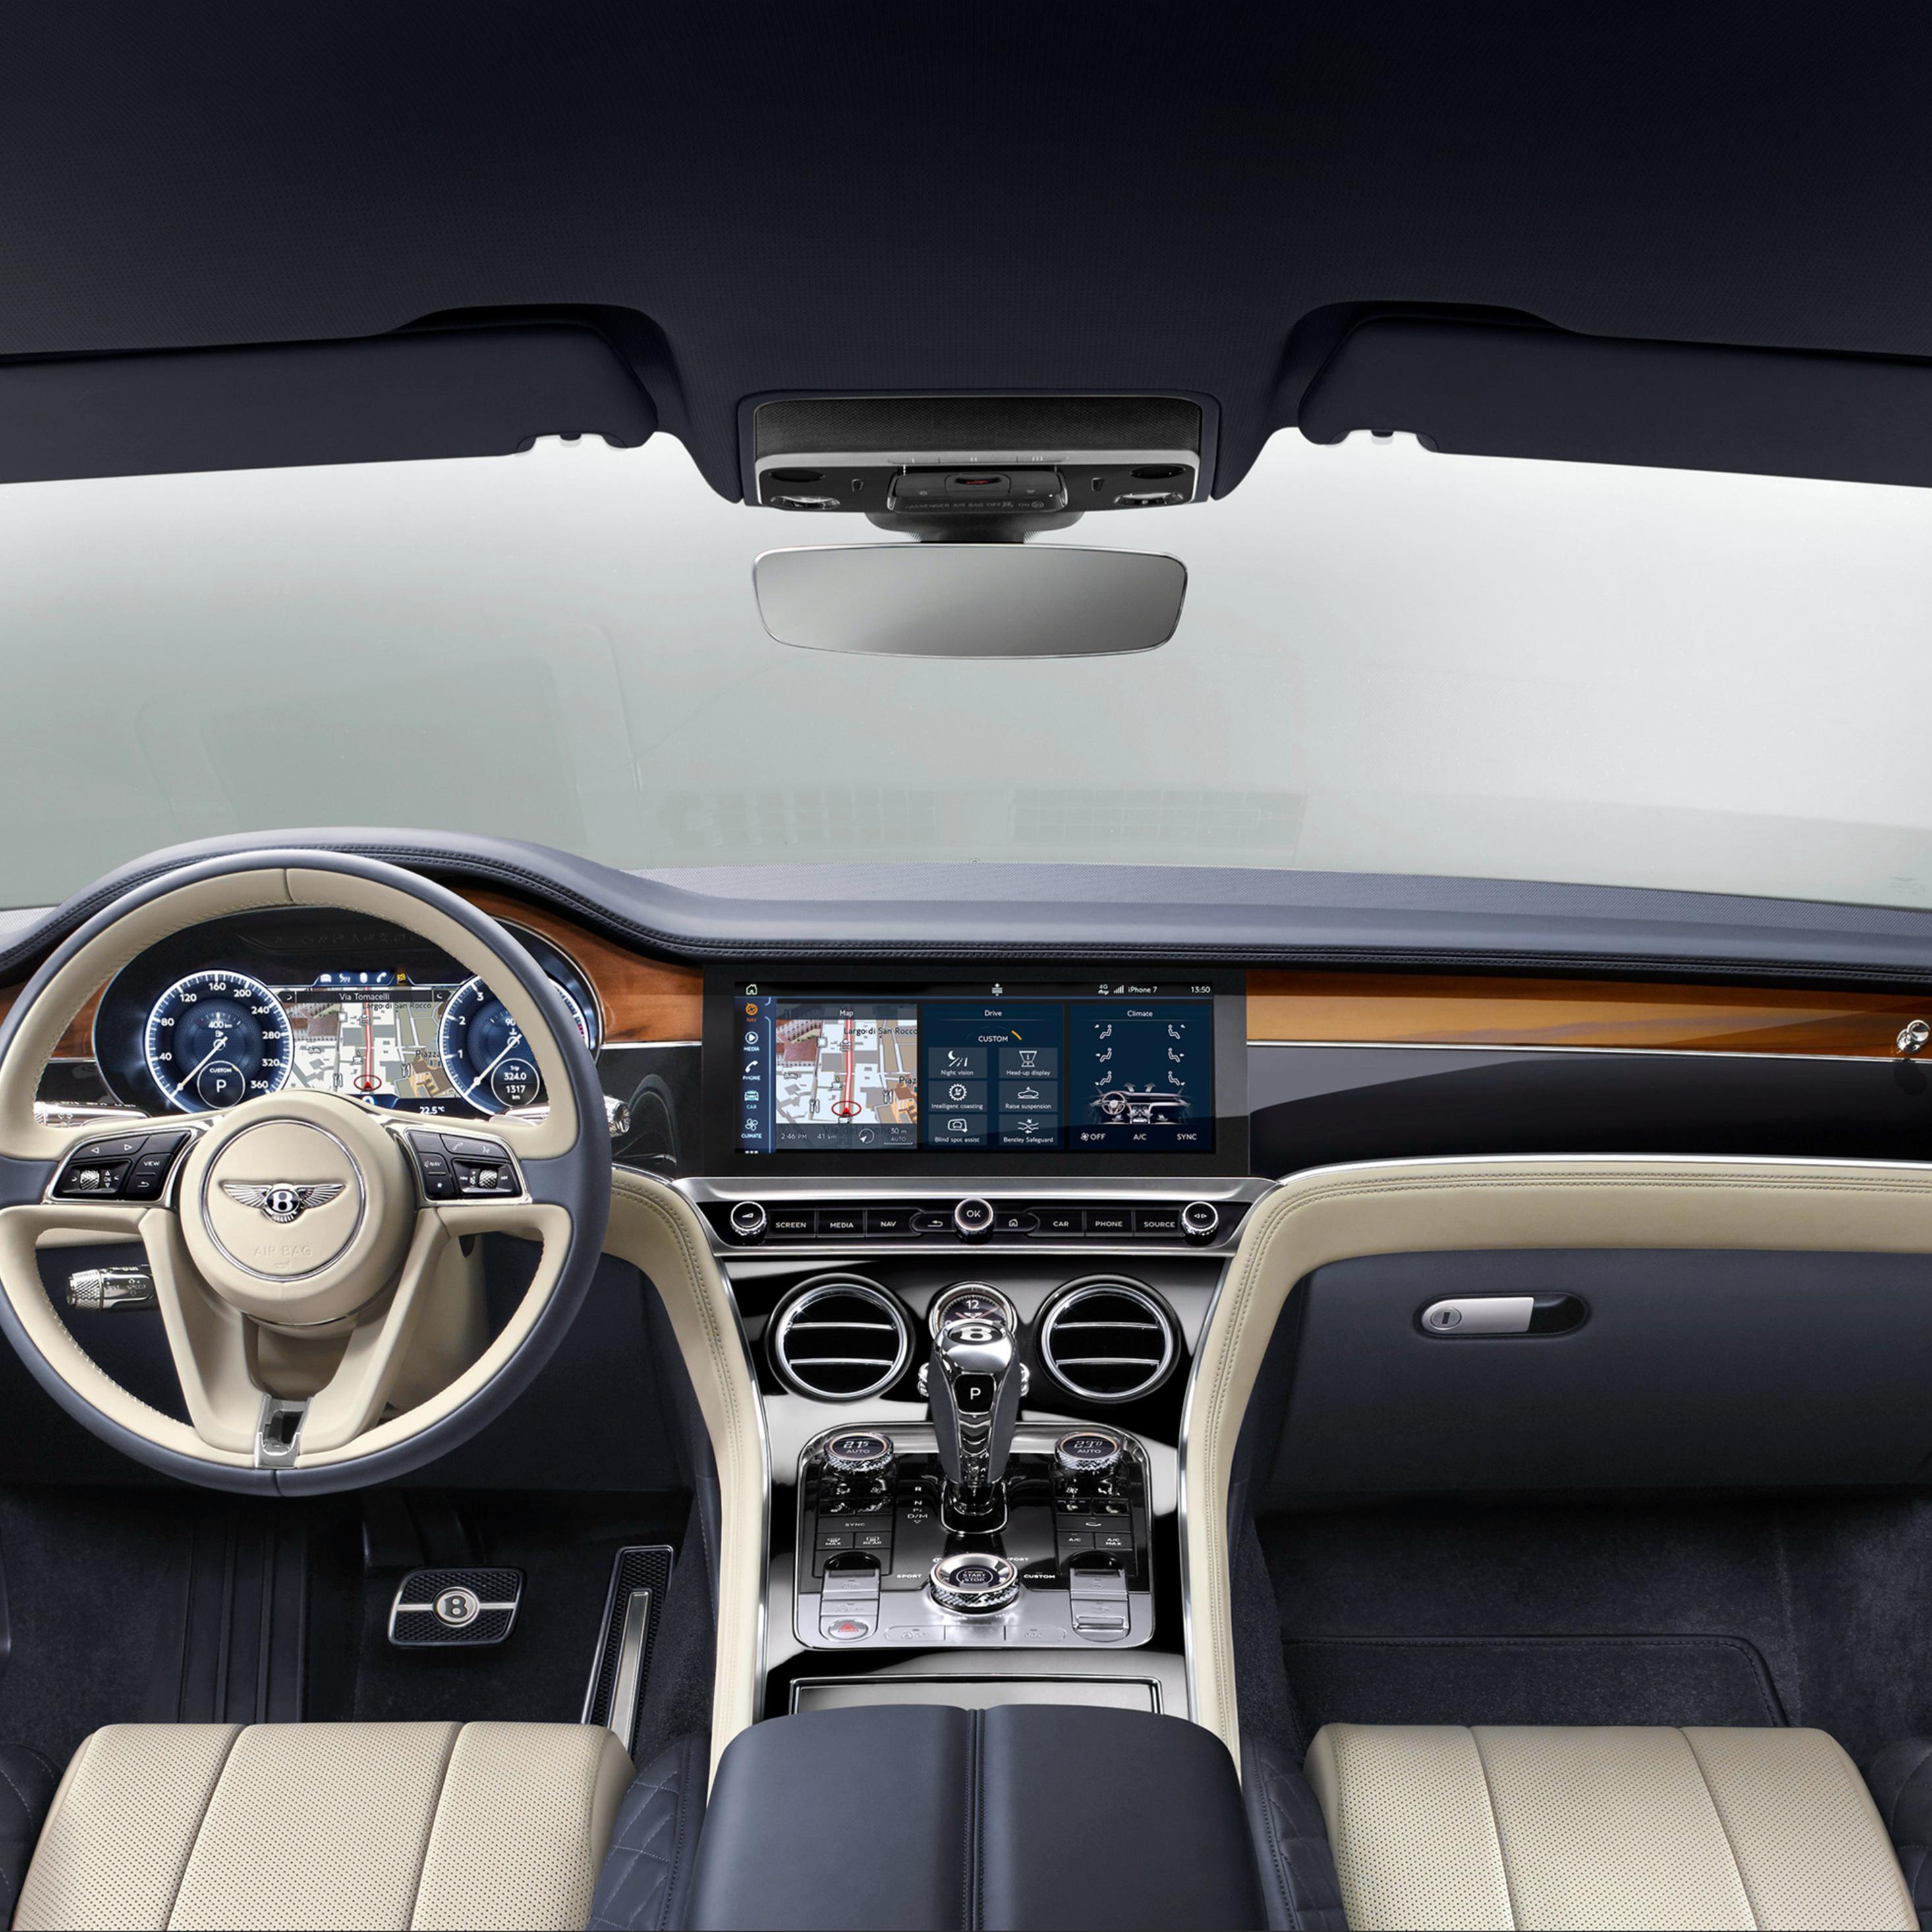 2932x2932 Bentley Continental Gt 2017 Interior Ipad Pro Retina Display Hd 4k Wallpapers Images